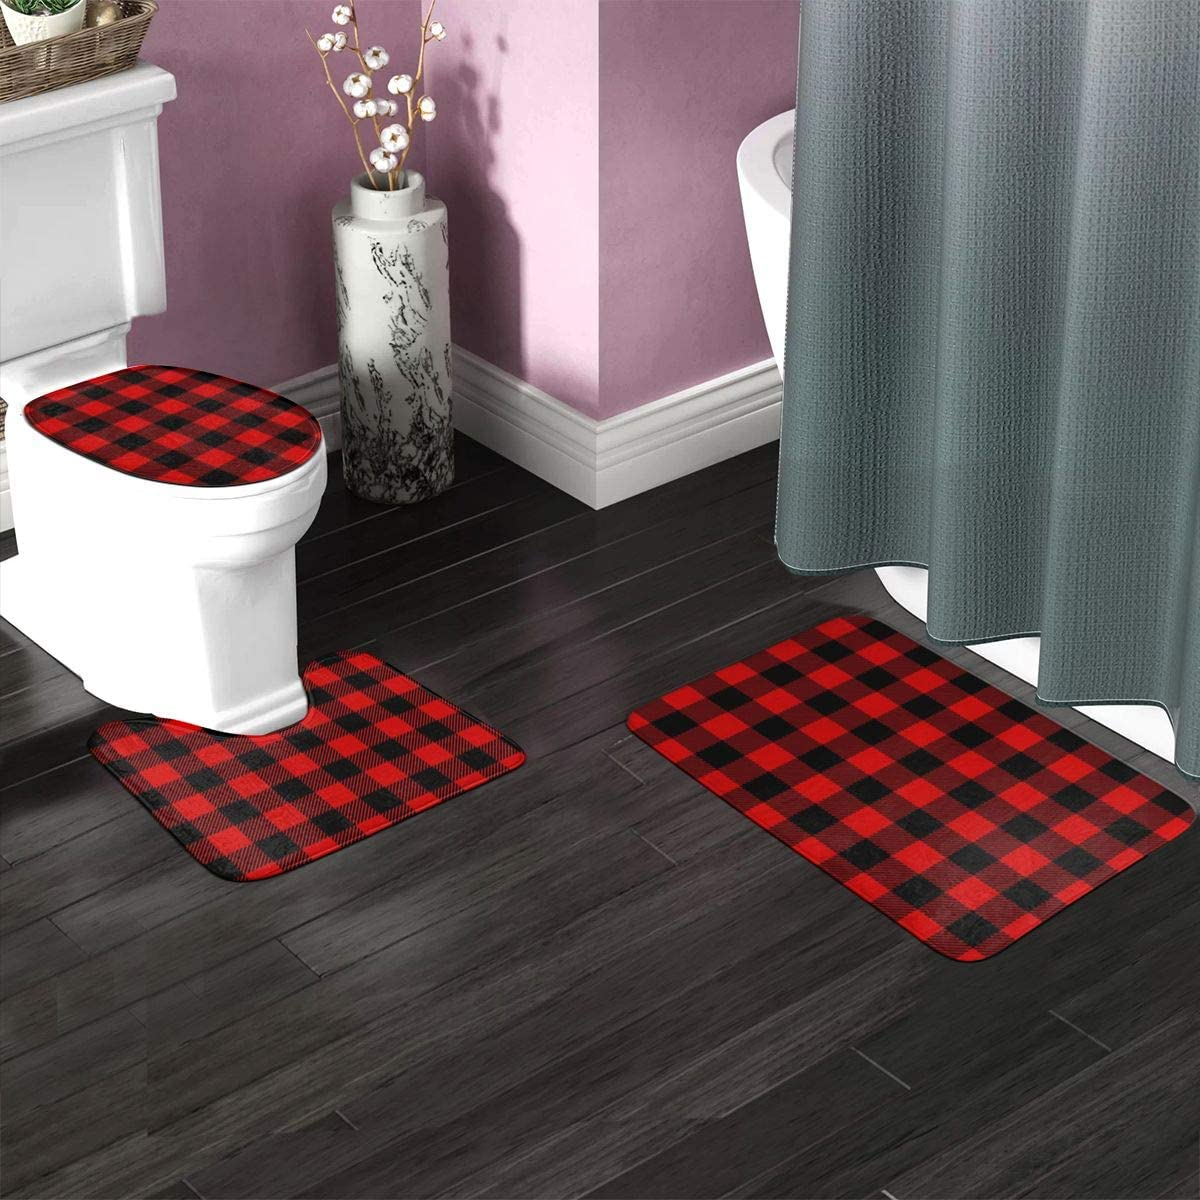 Amazon Com Bian 63 Buffalo Plaid Check Red Black Bathroom Rug Mat Bath Accessories Set 3 Piece Non Slip Bath Mat Pedestal Rug U Shaped Contour Mat Lid Toilet Cover Pad Home Kitchen